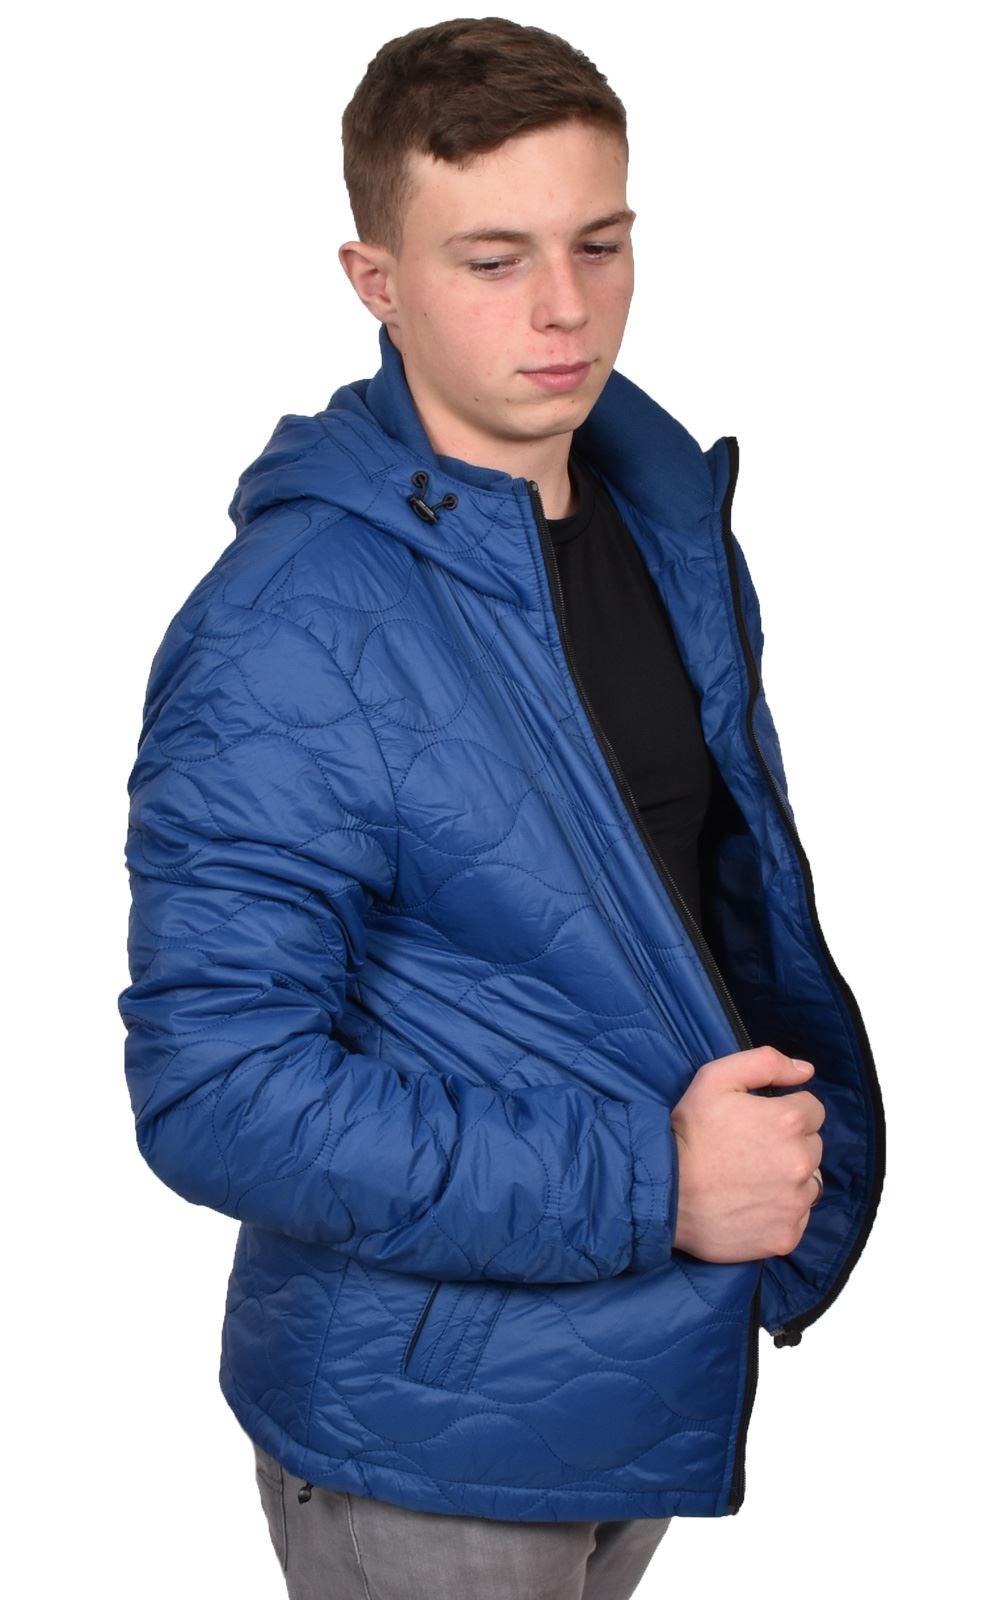 Mens-Smith-amp-Jones-Jacket-Full-Zip-Fleece-Lined-Hooded-Light-Weight-Warm-Coat thumbnail 11